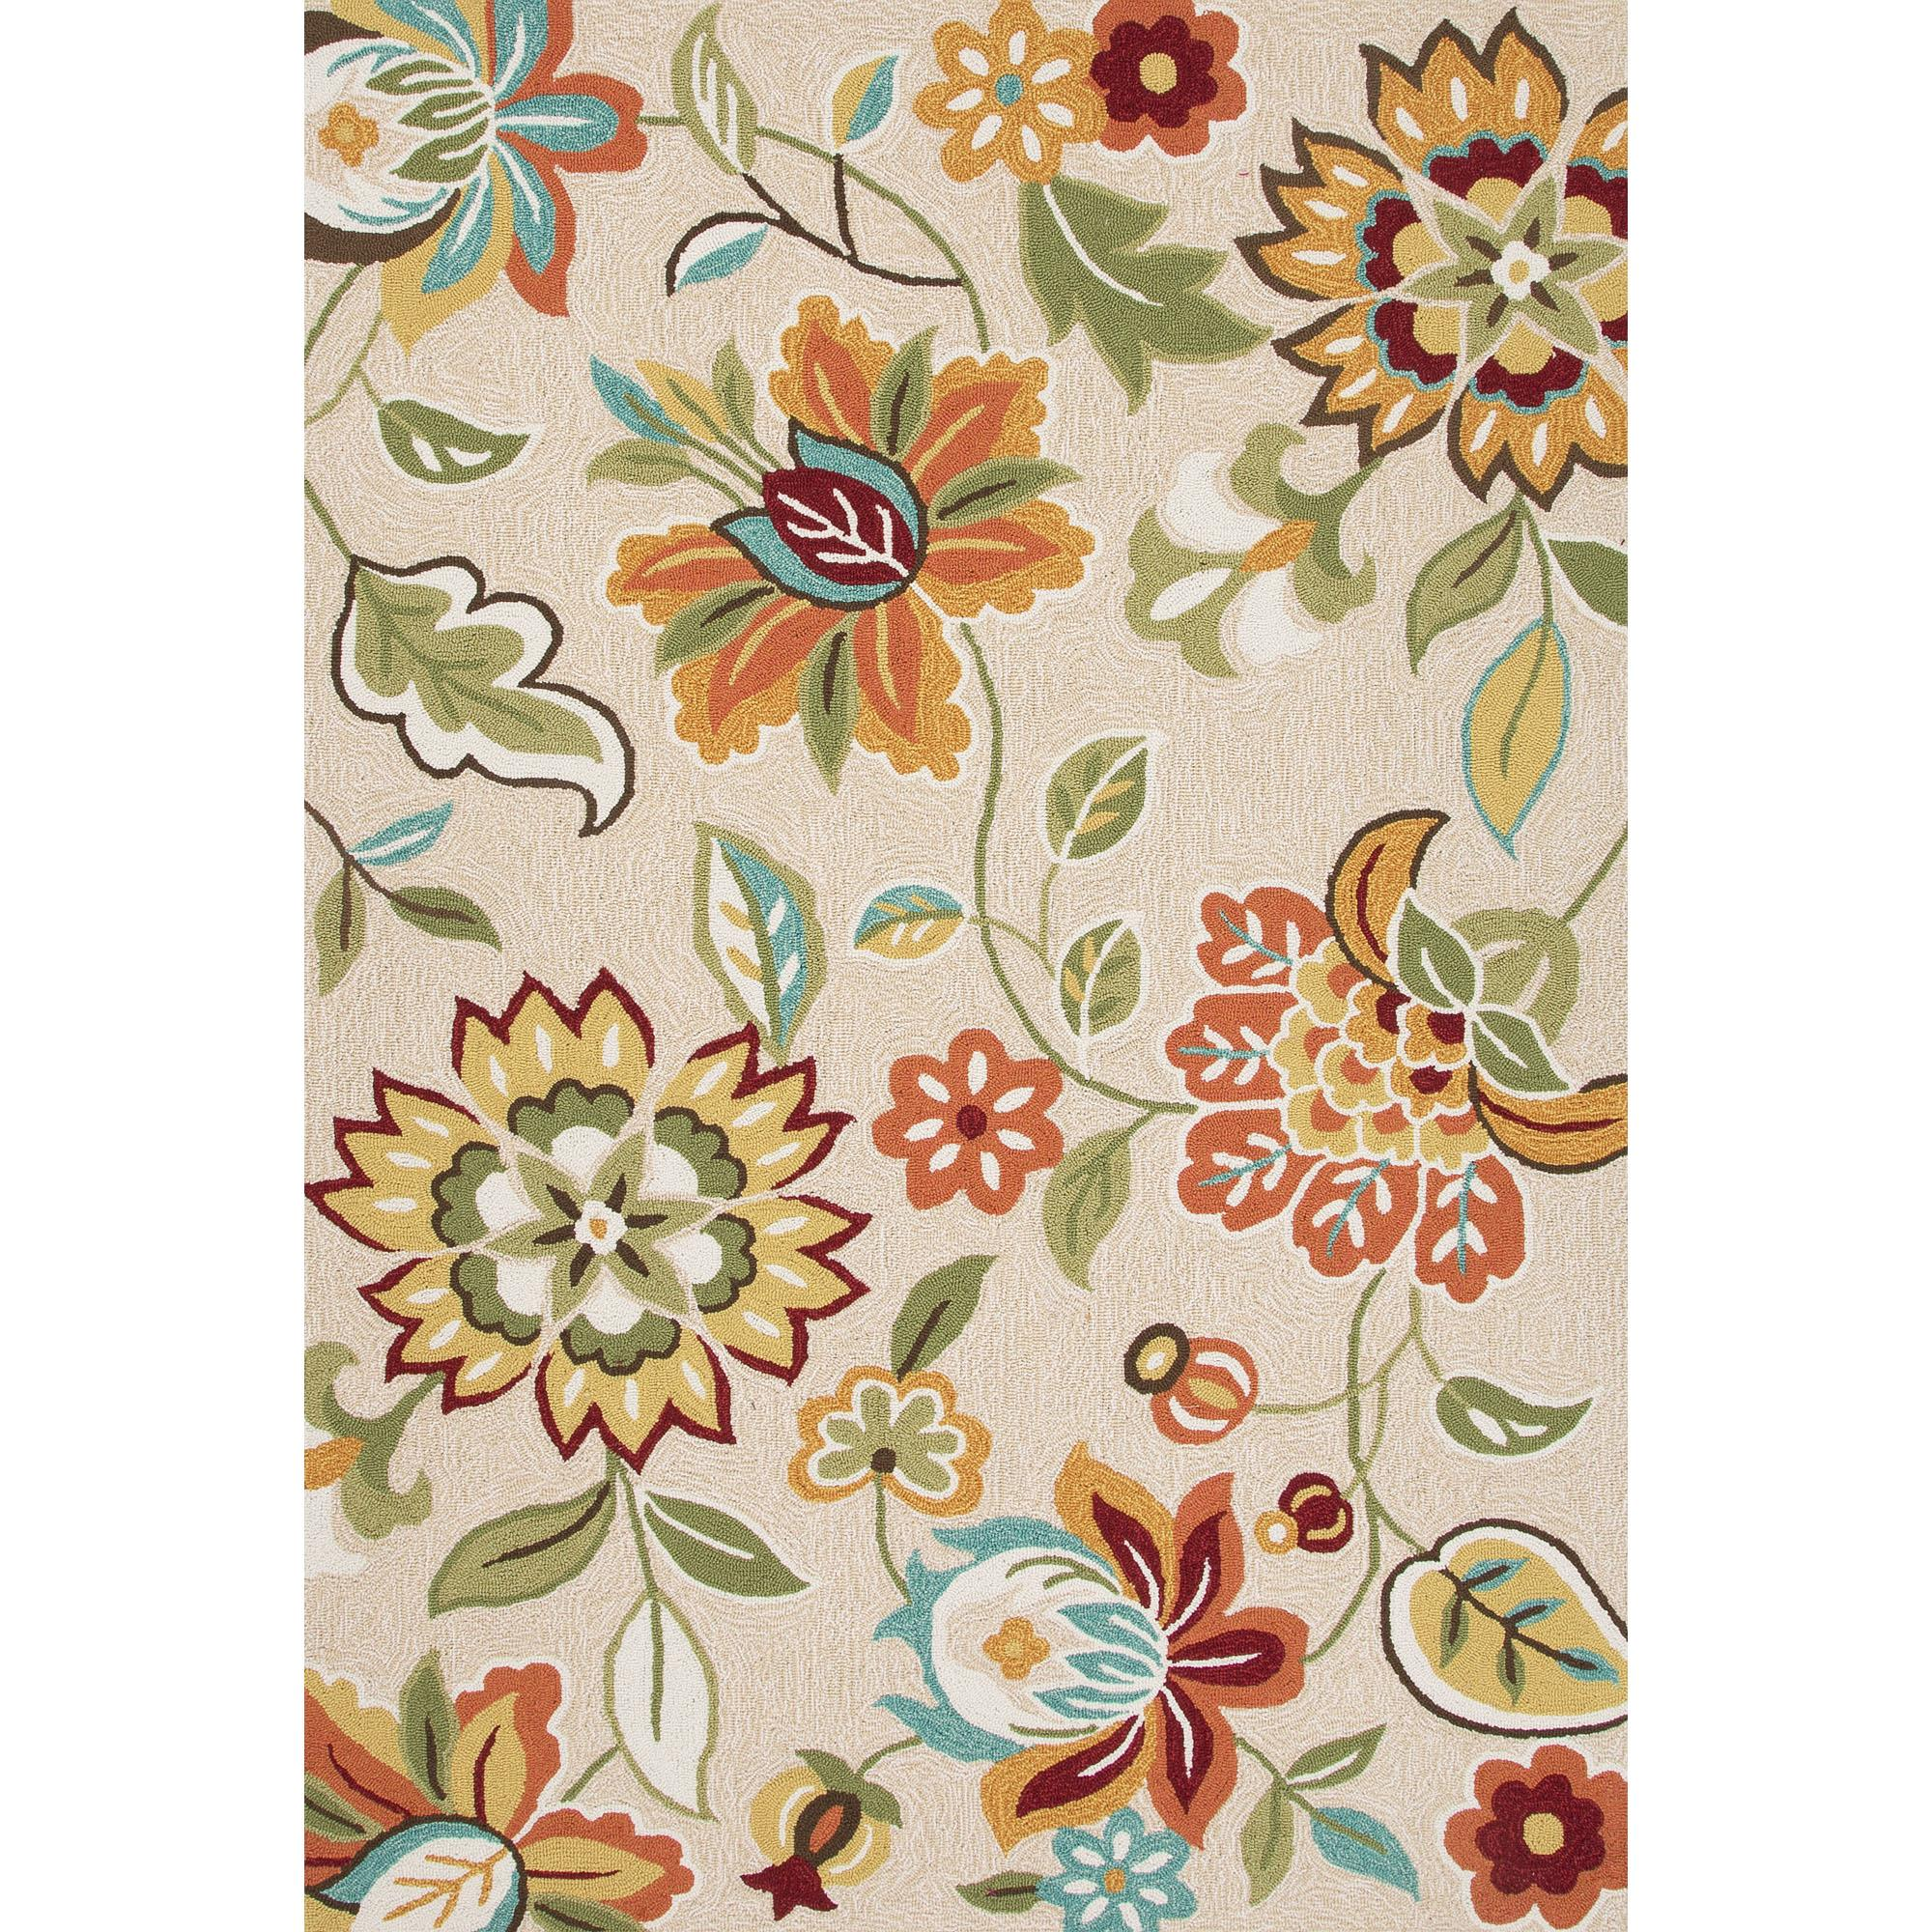 JAIPUR Rugs Blossom 2 x 3 Rug - Item Number: RUG122609